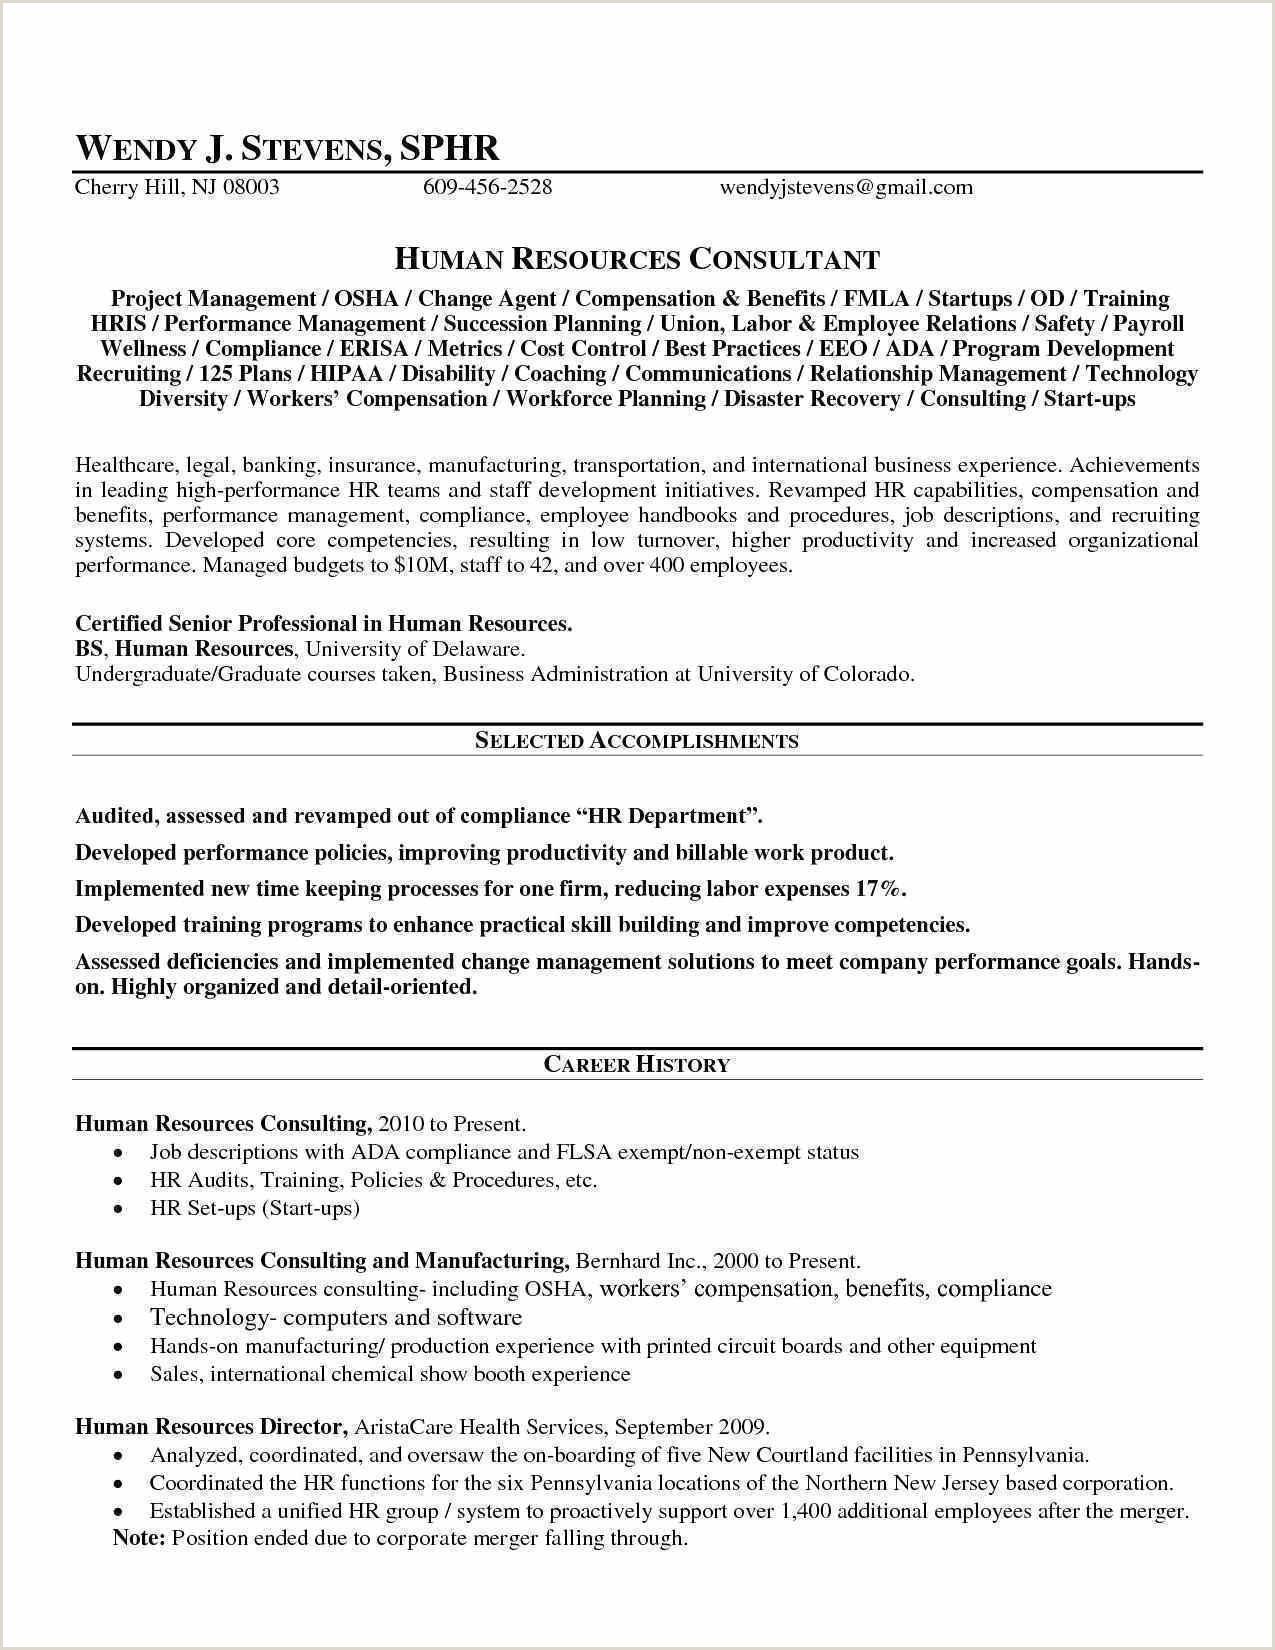 Wendys Crew Member Job Description Human Resources Manager Resume